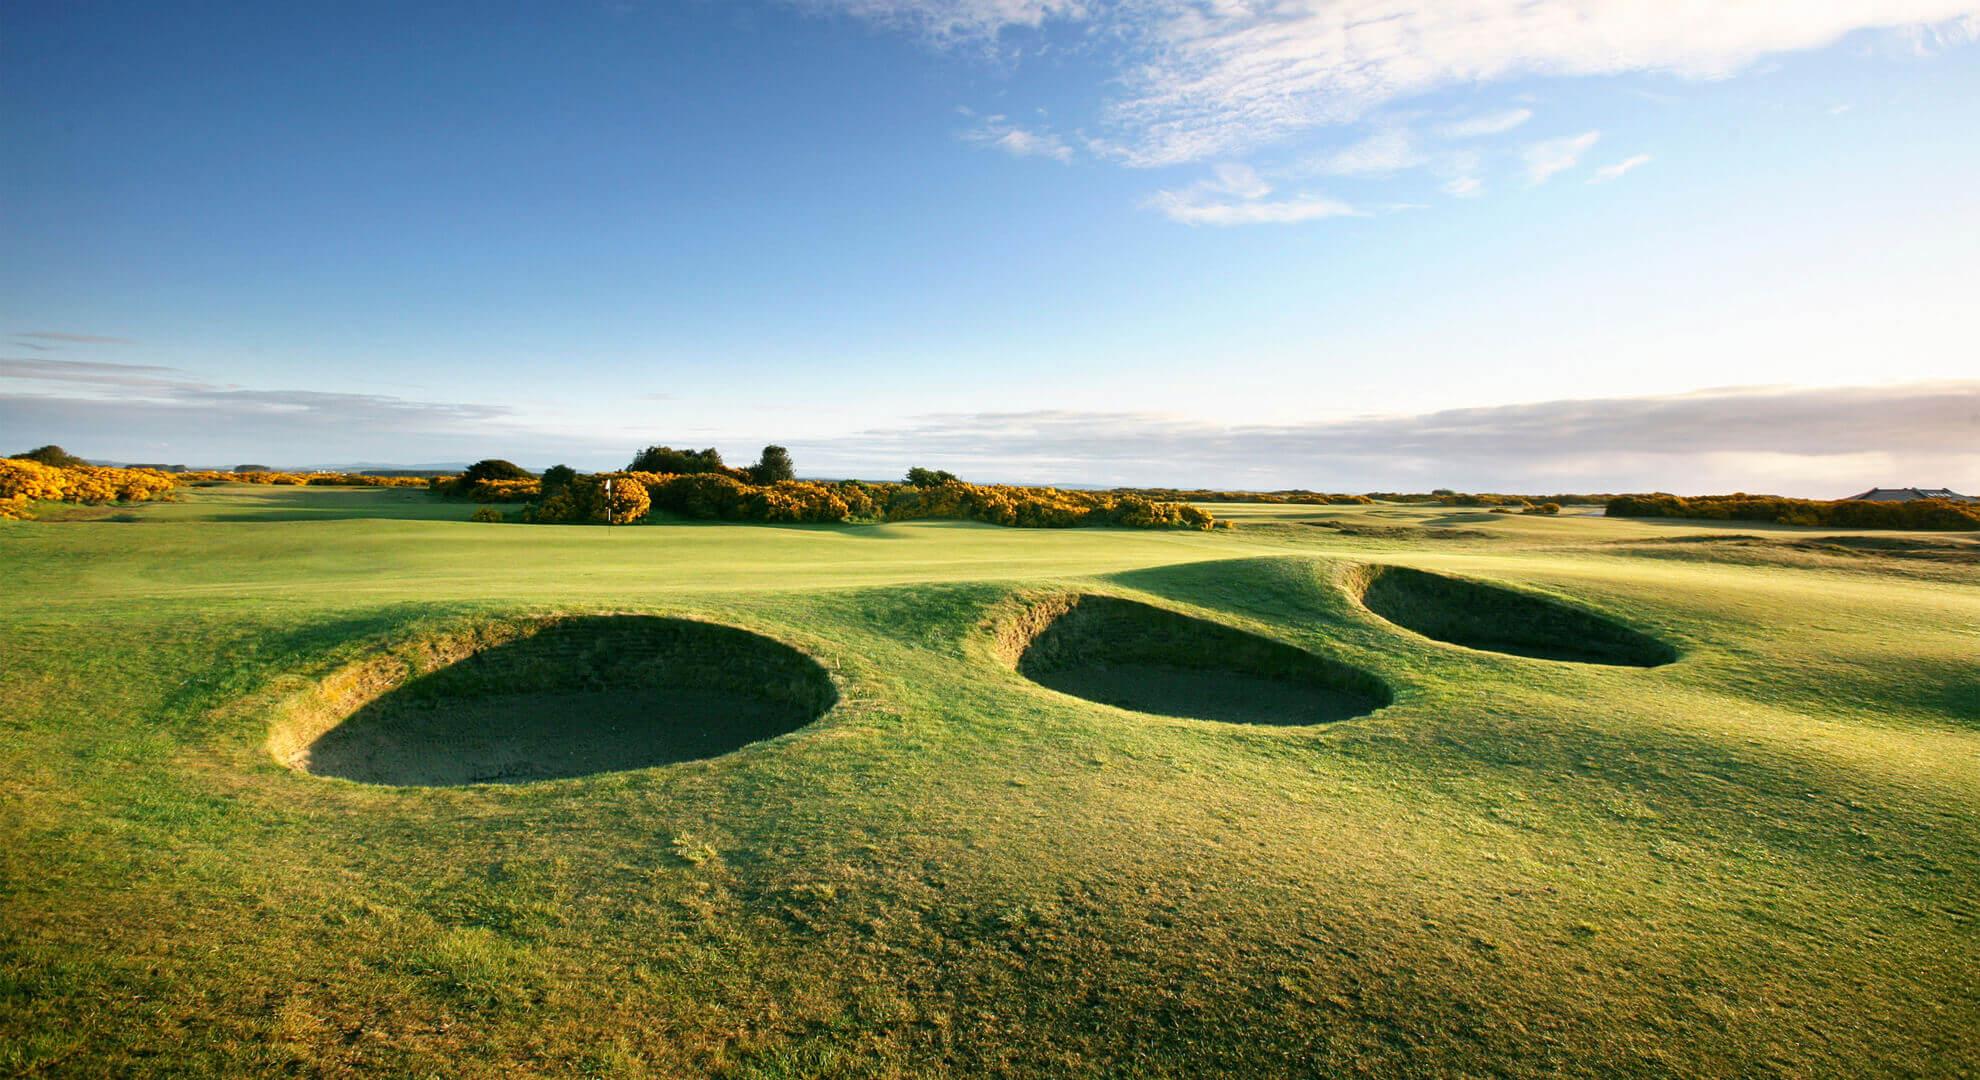 New Golf Course, Fife